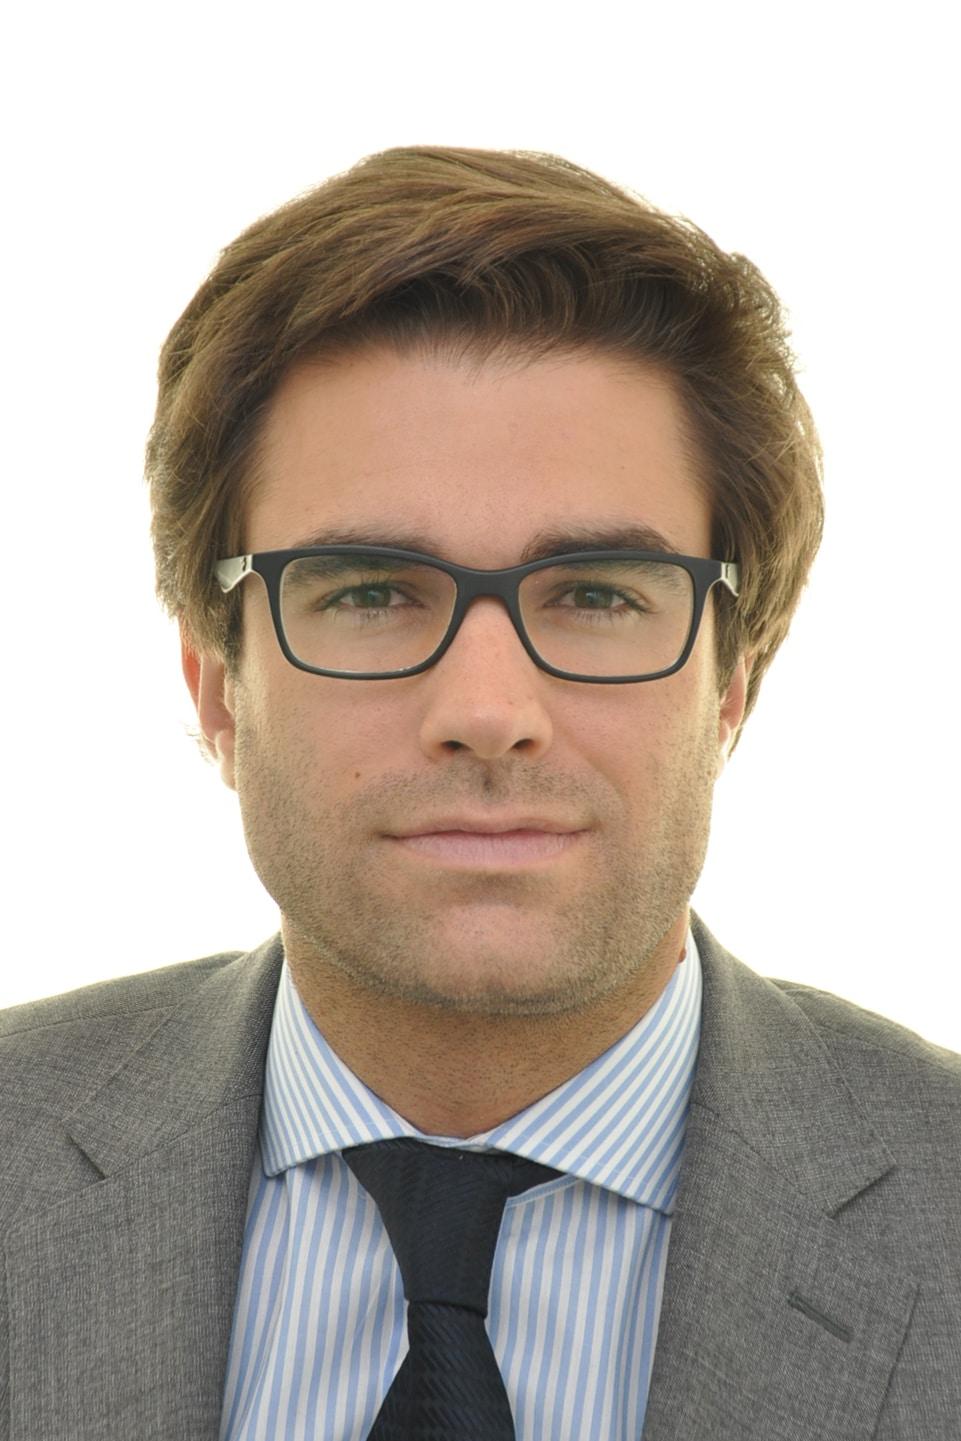 Fernando López-Fando